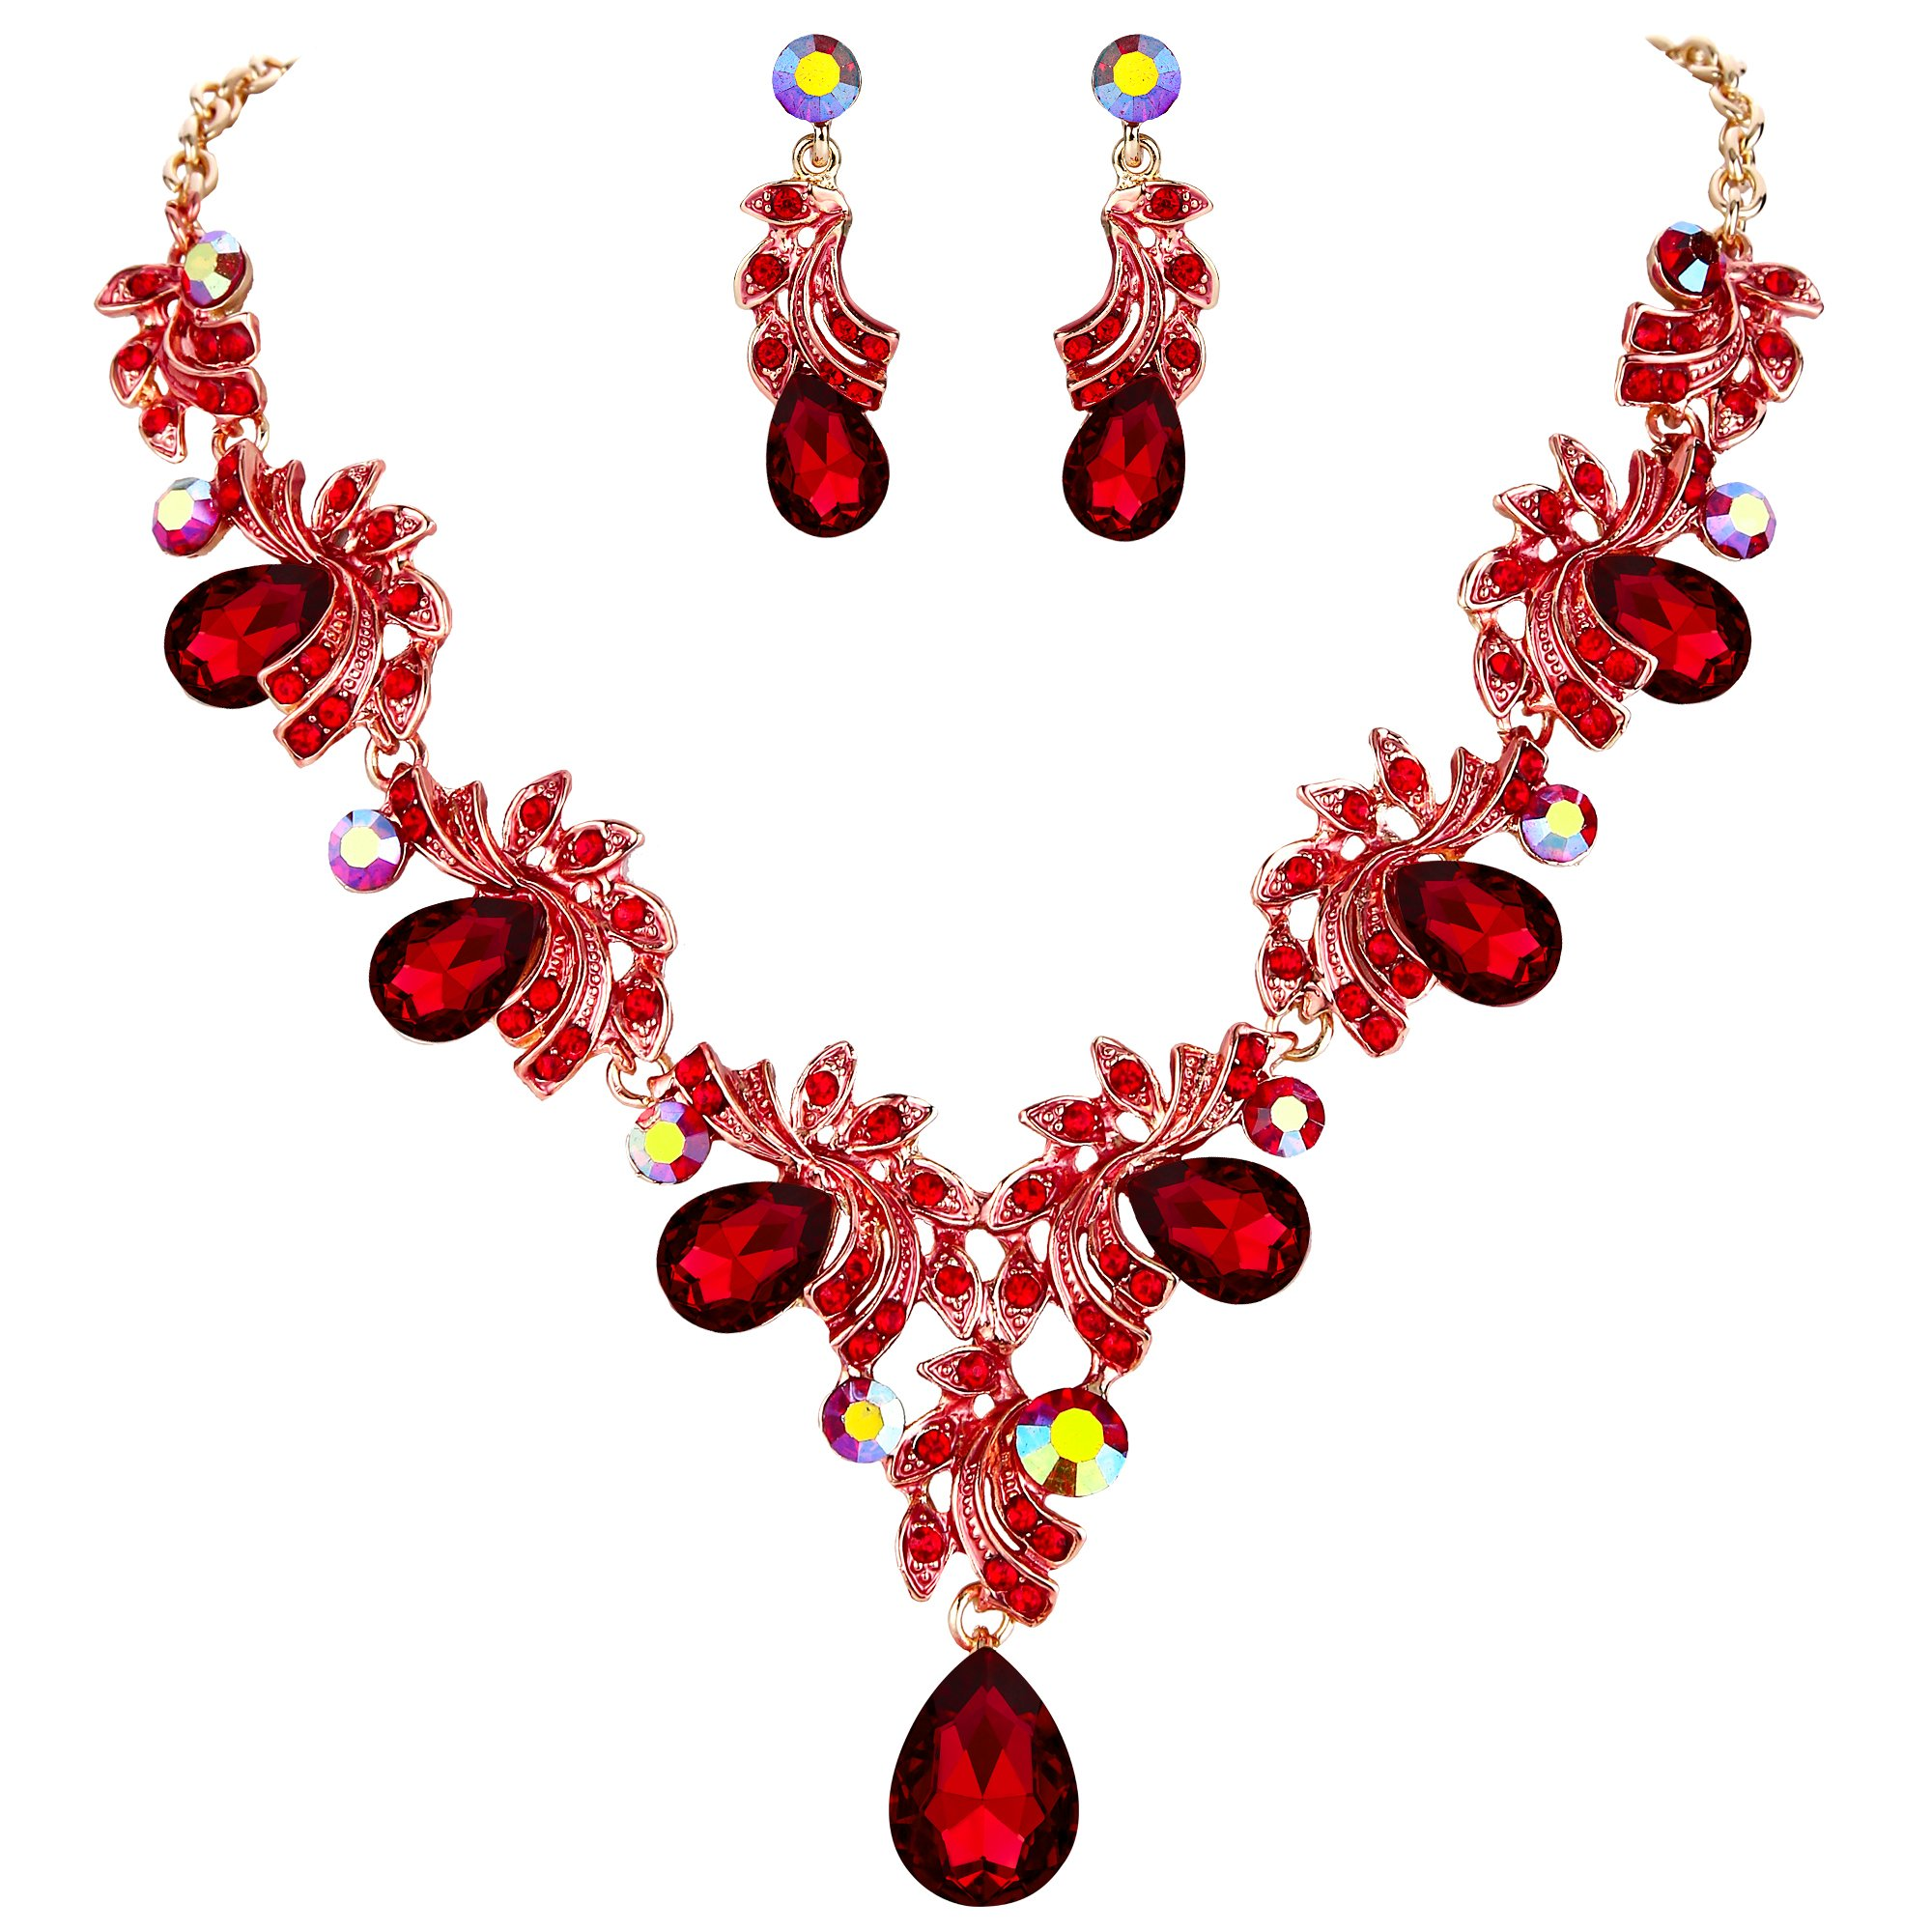 BriLove Wedding Bridal Necklace Earrings Jewelry Set Women Crystal Teardrop Filigree Leaf Twig Enamel Statement Necklace Dangle Earrings Set Ruby Color Gold-Toned